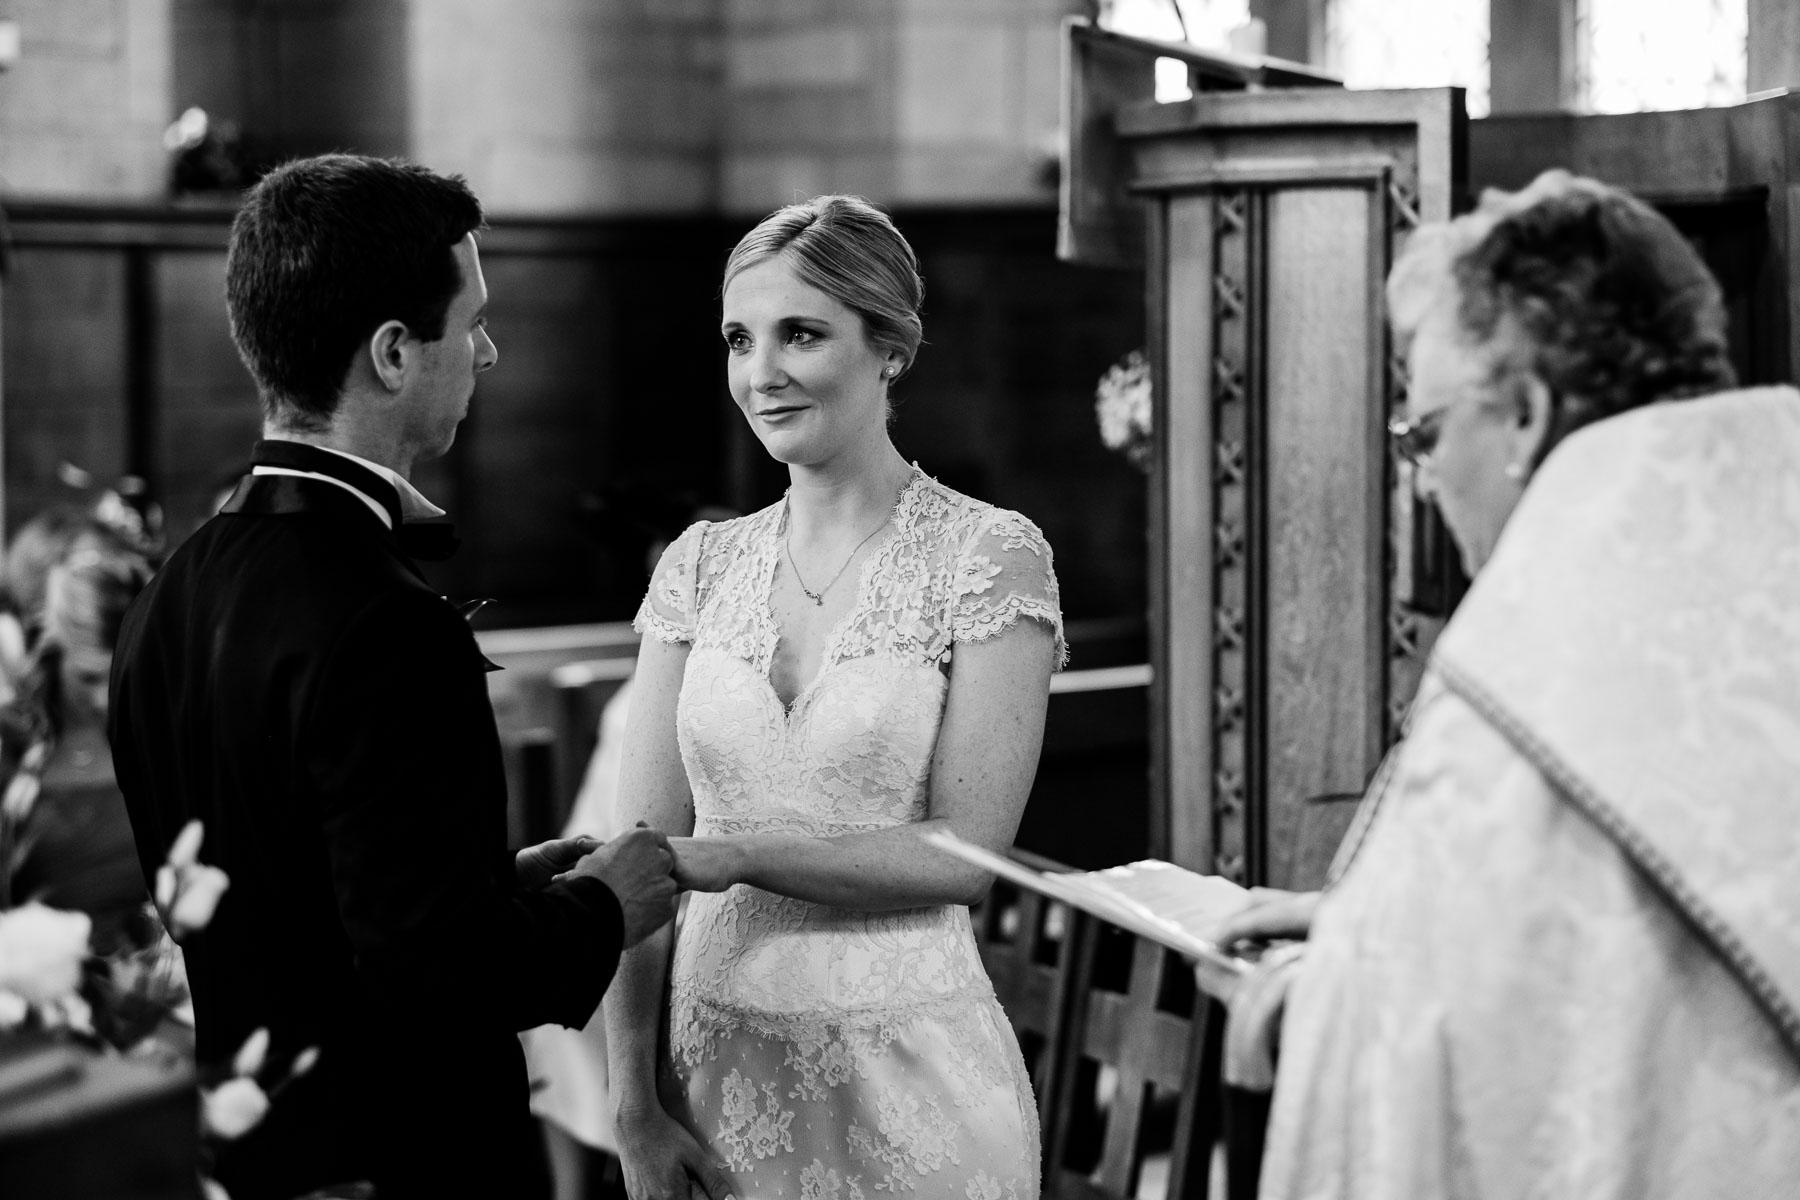 Crathorne Hall Wedding Photography - Jo & Paul (95).jpg